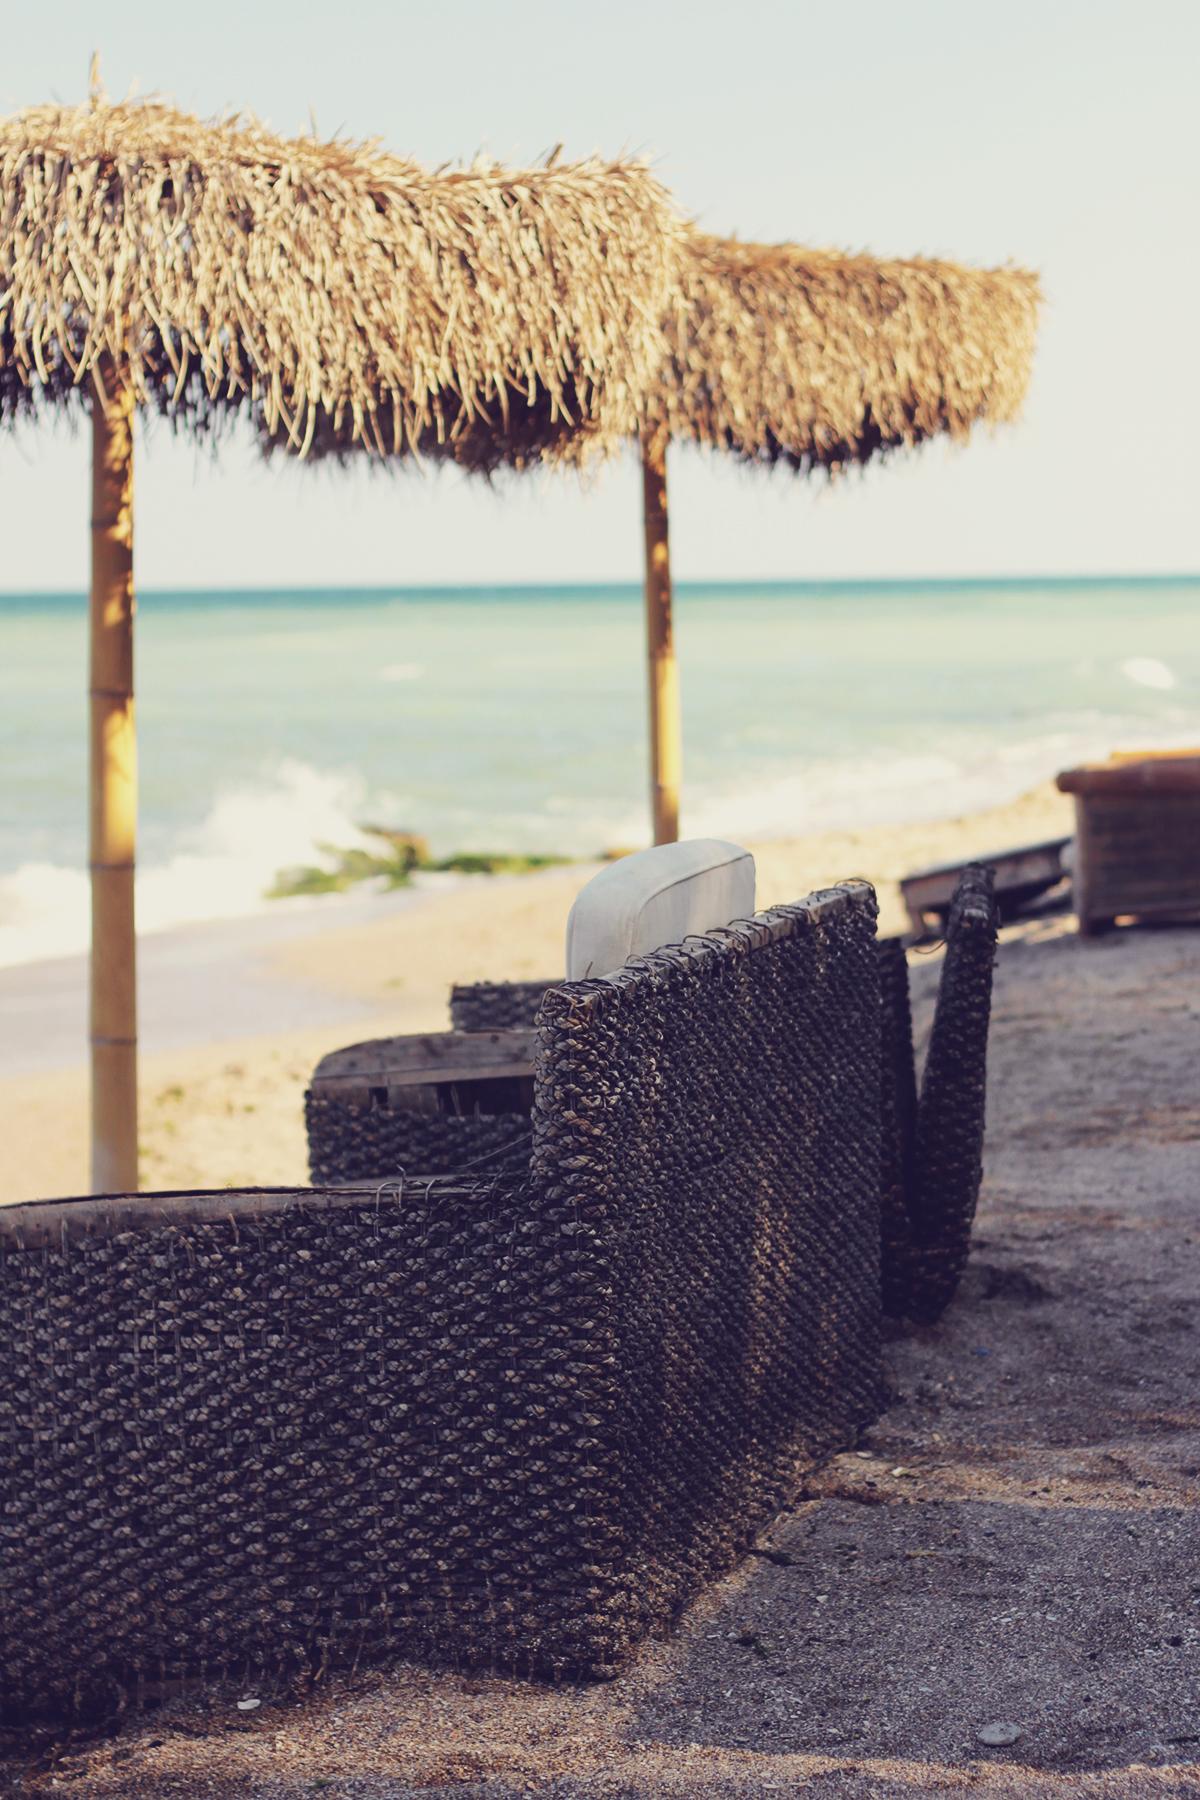 couch and umbrellas, vama veche, beach